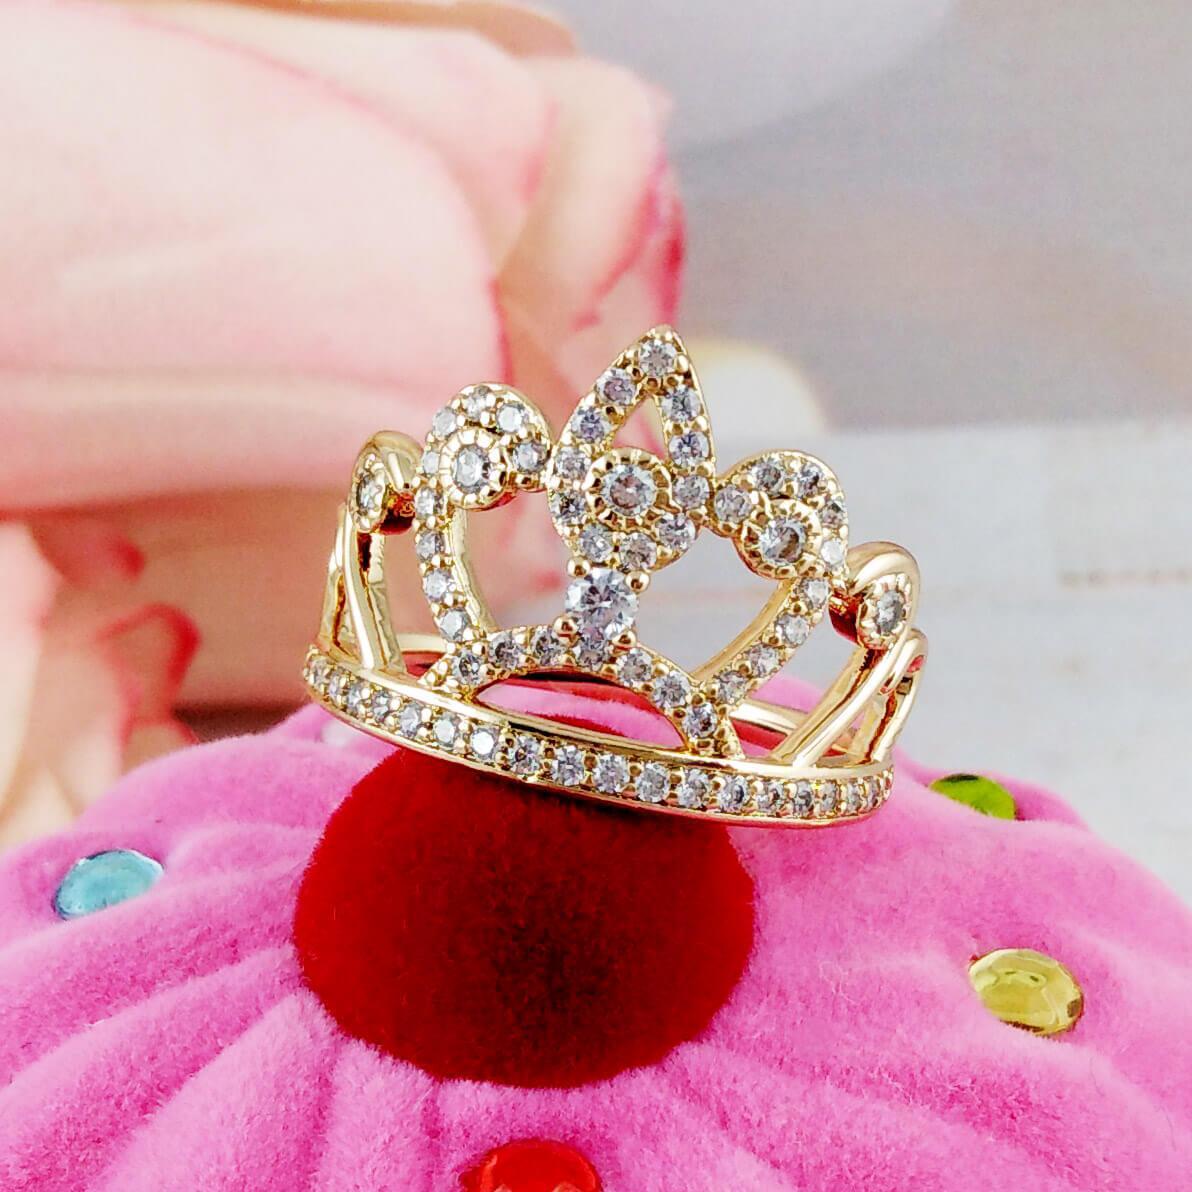 Кольцо Xuping Jewelry размер 20 Корона медицинское золото позолота 18К. А/В 4153